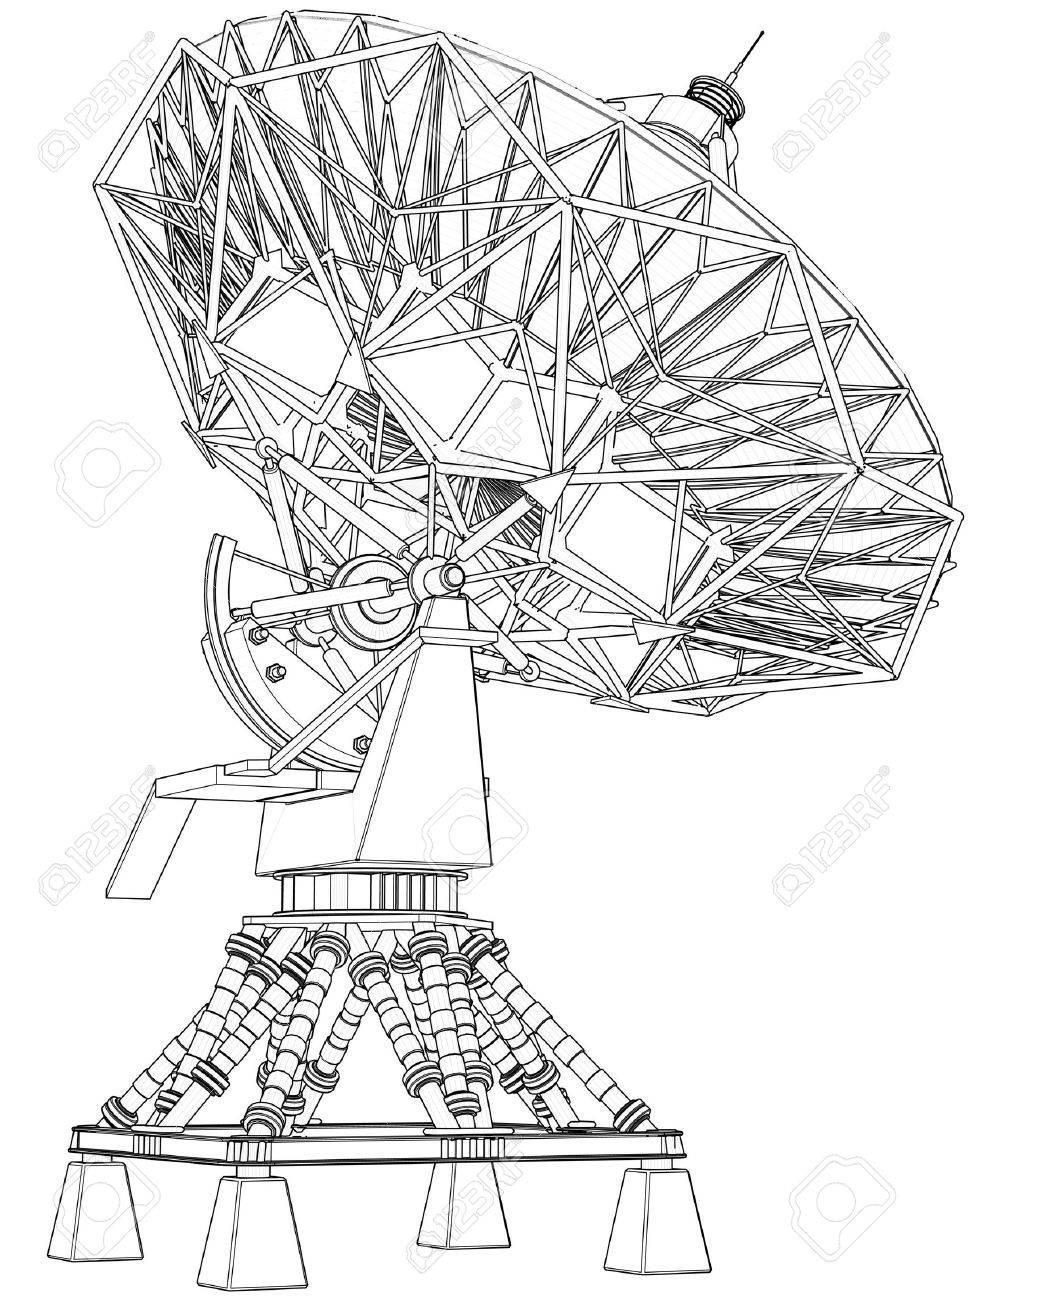 1040x1300 Satellite Dishes Antenna (Doppler Radar) Technical Draw Stock